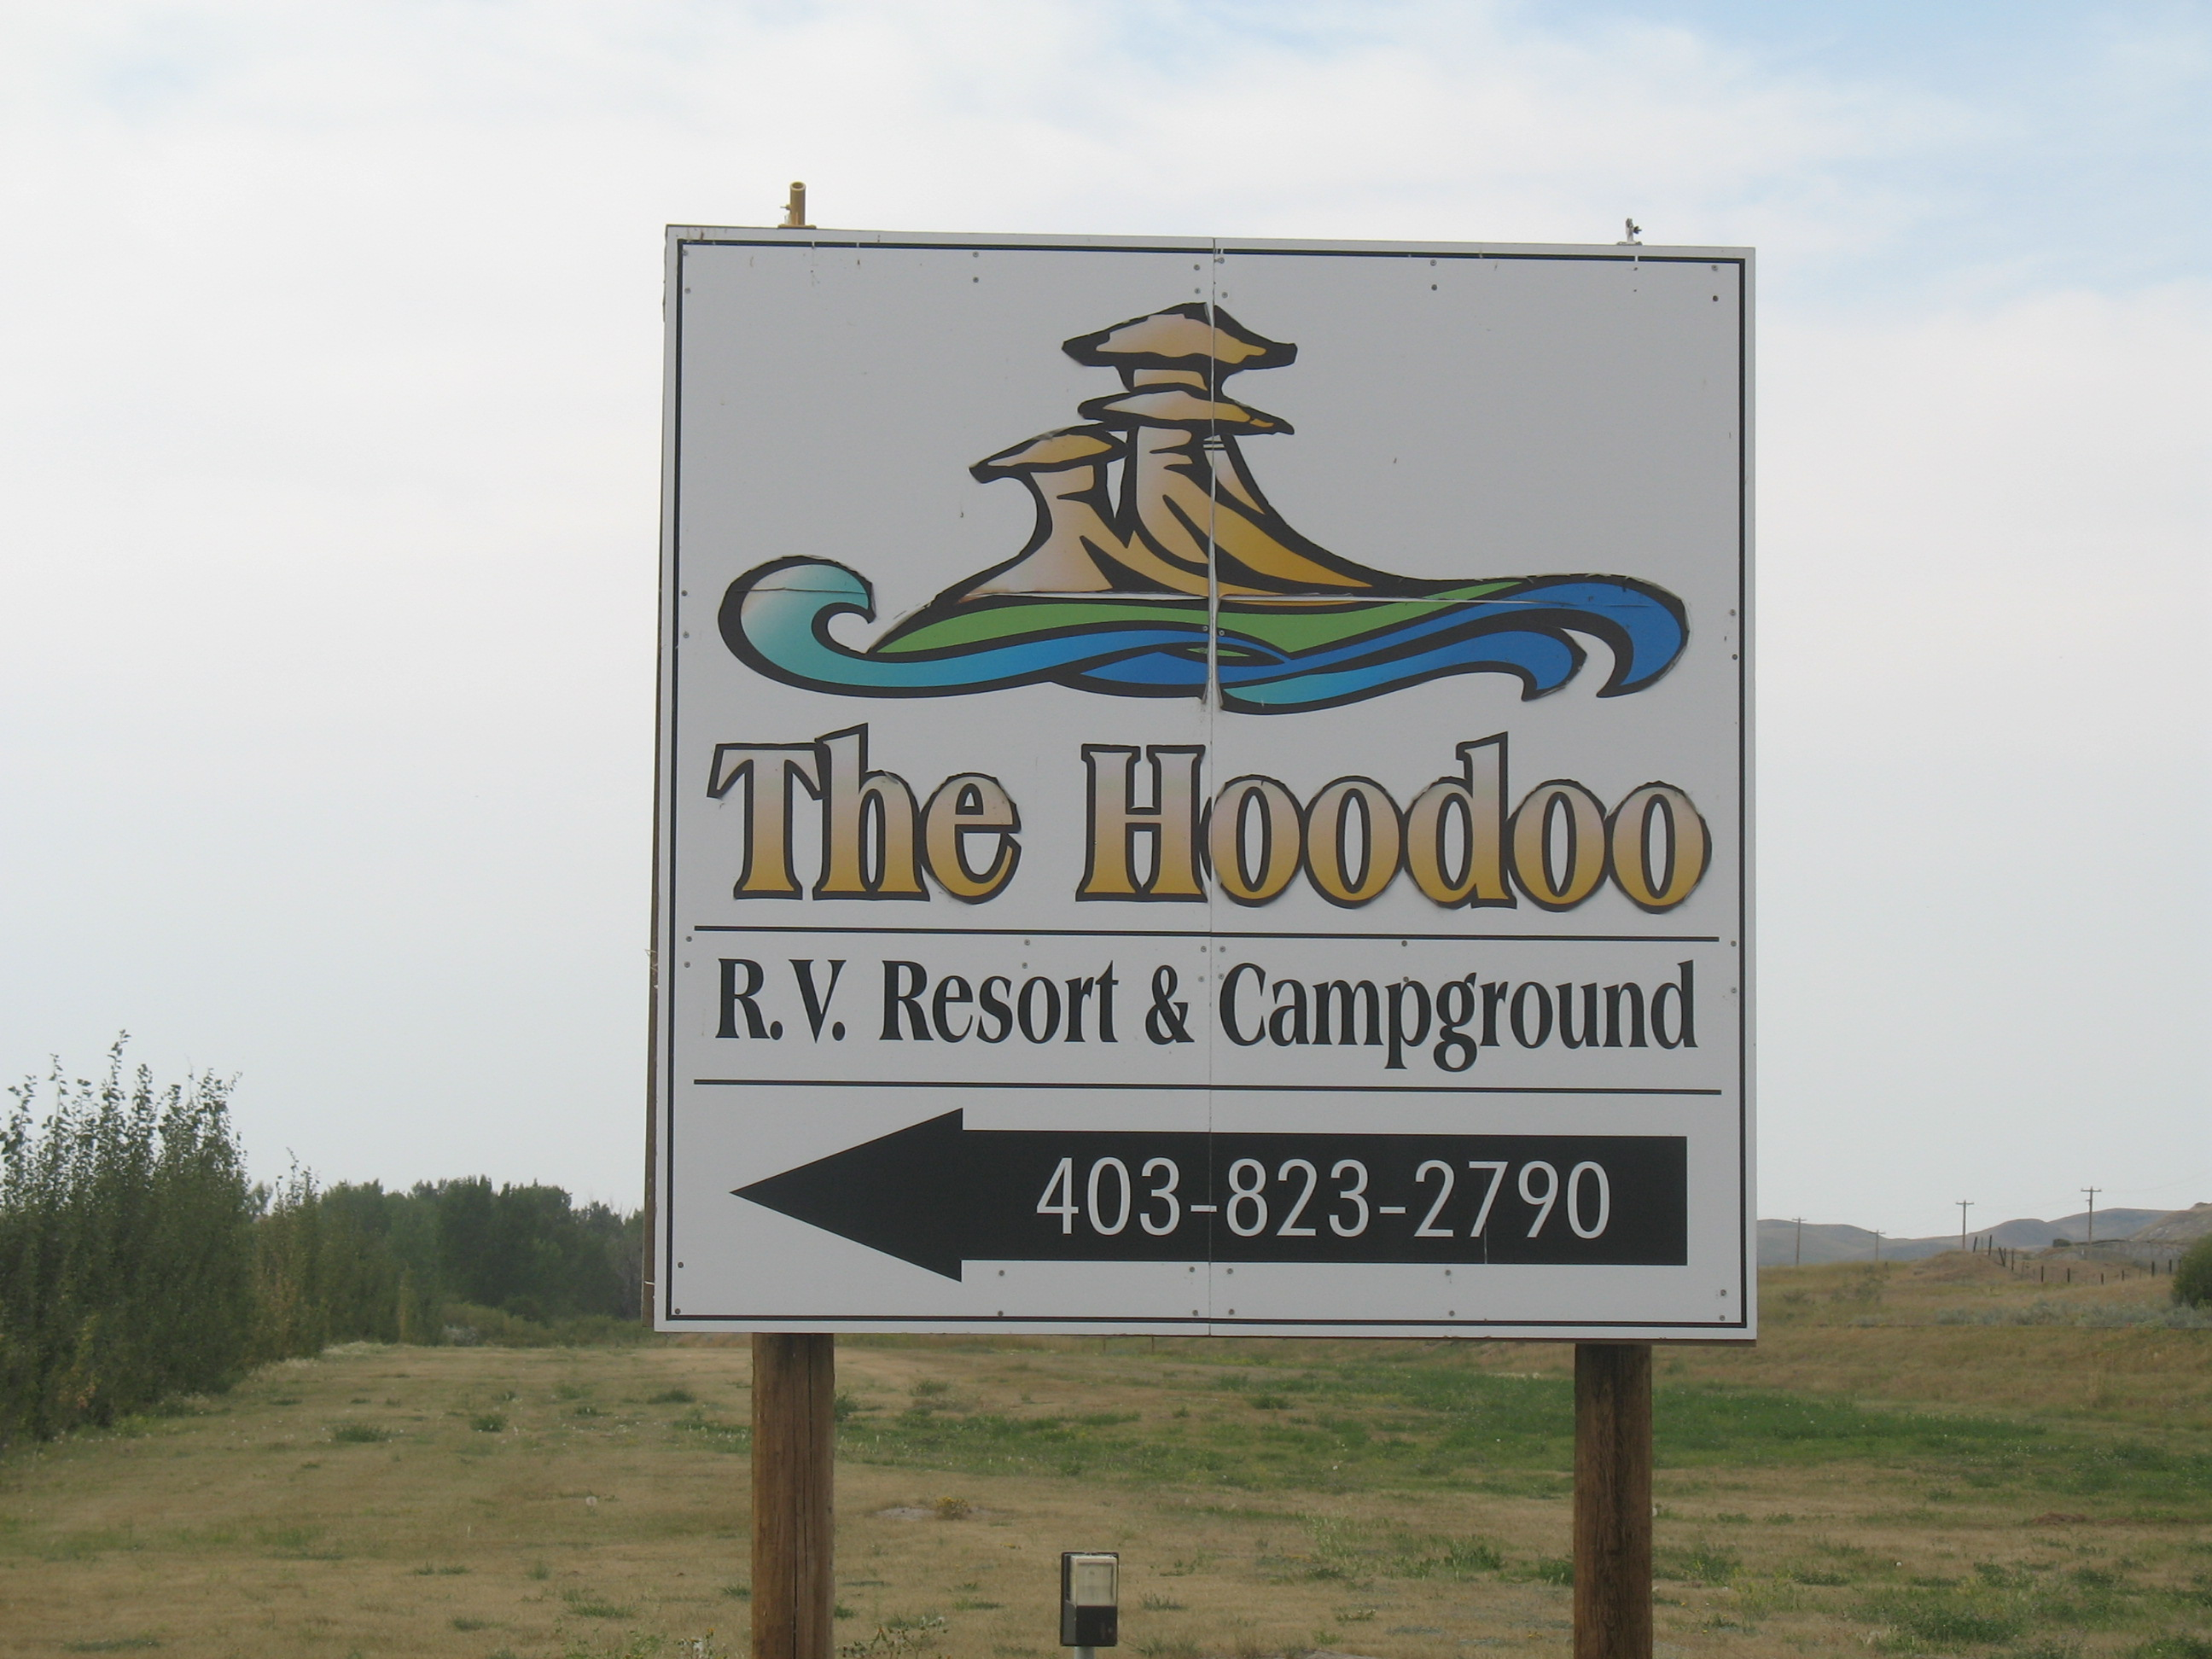 The Hoodoo RV Resort & Campground - Alberta Campsites com